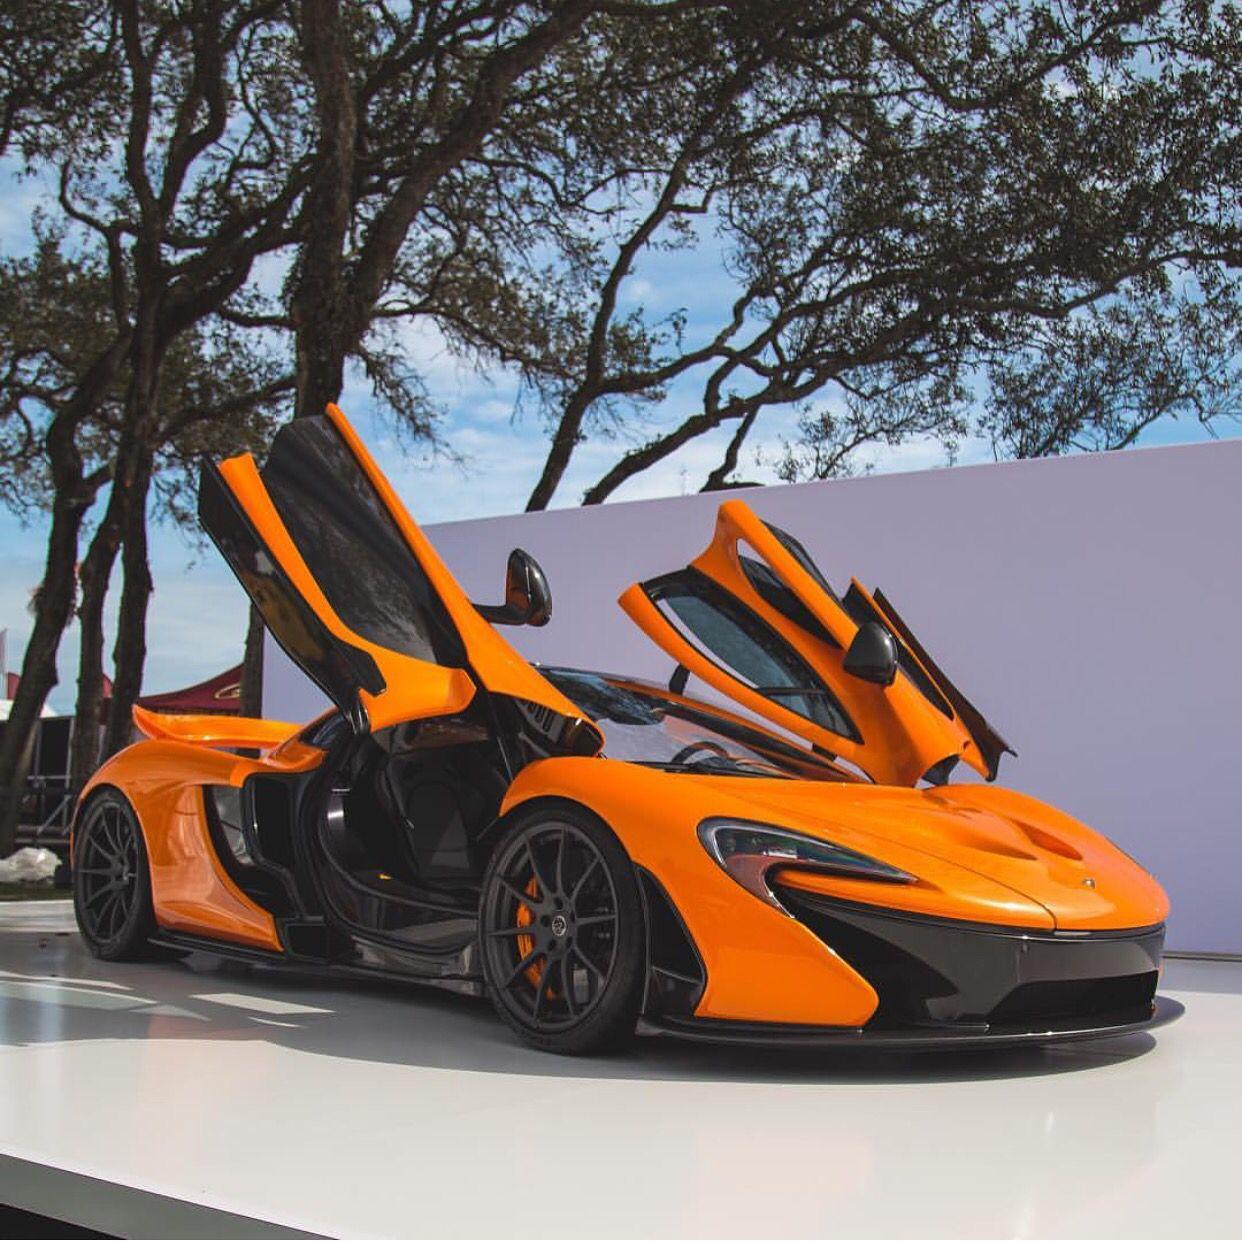 McLaren P1 Painted In Papaya Spark W/ Exposed Carbon Fiber Photo Taken By: @